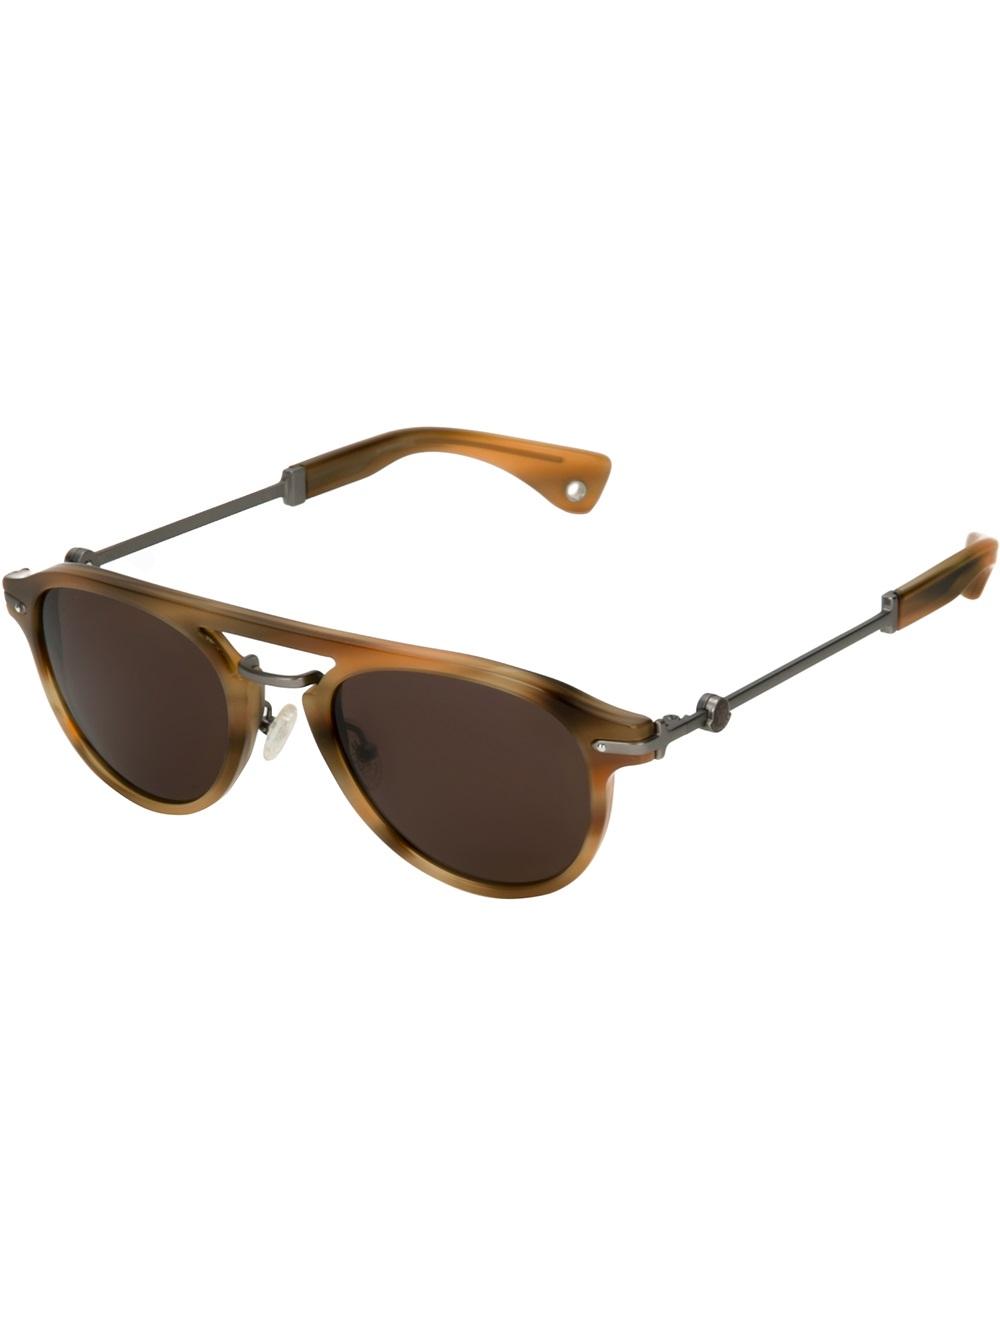 b65d9422d30 Lyst - Moncler Mc503 Sunglasses in Brown